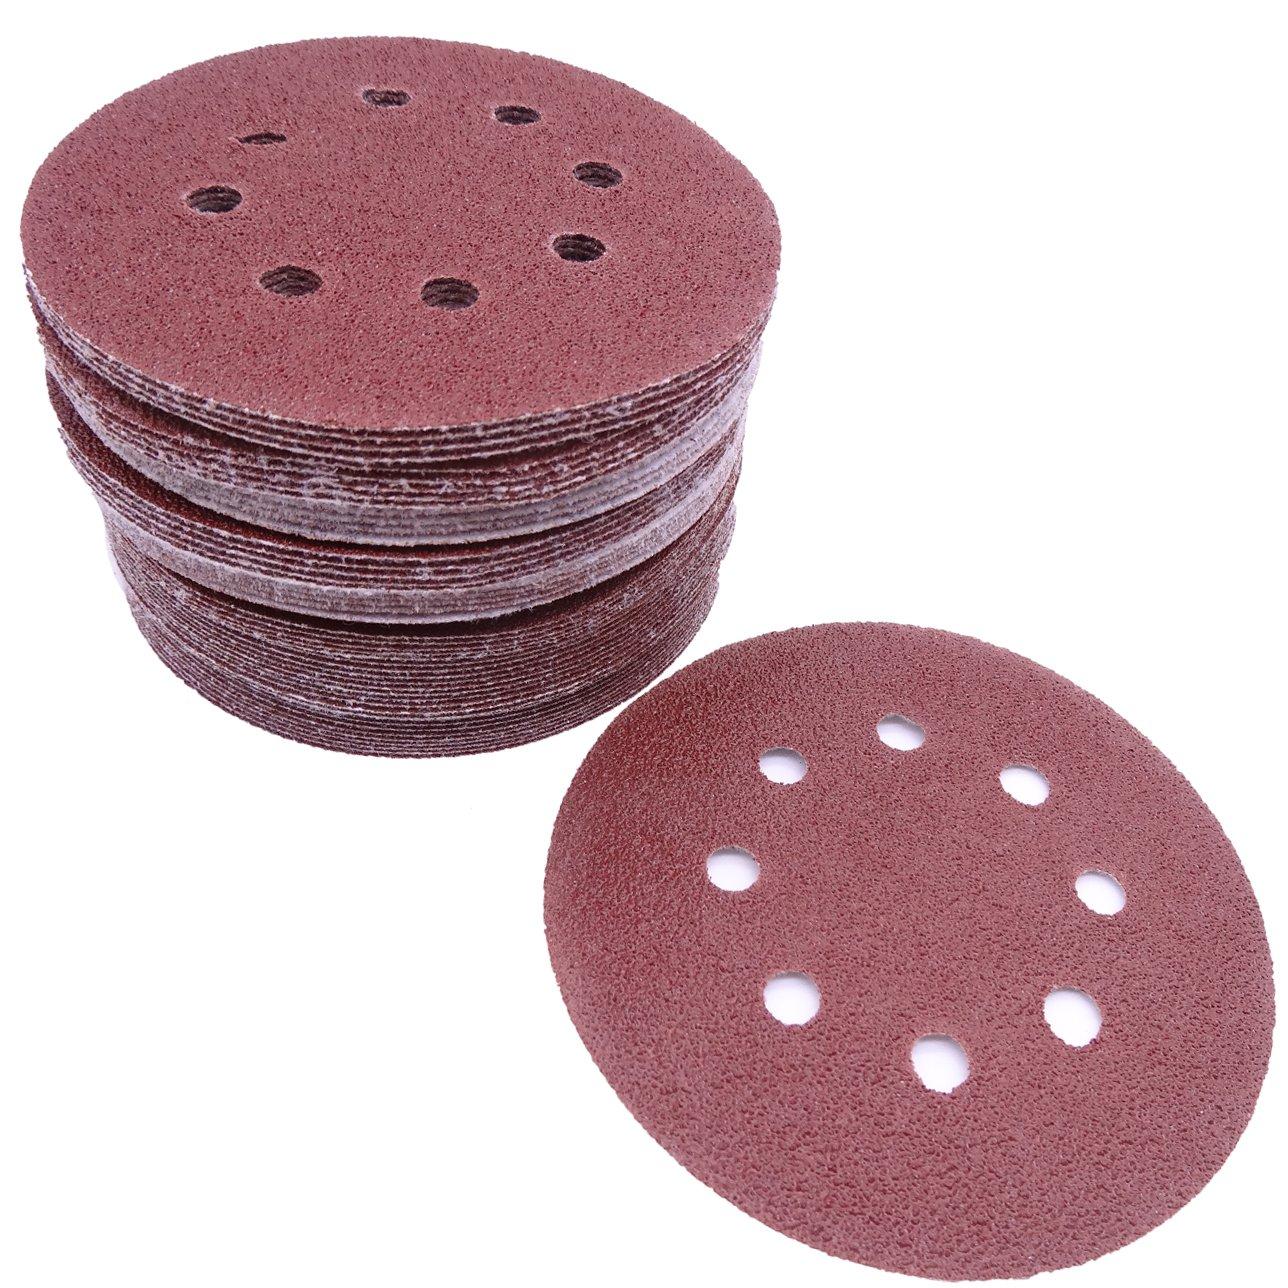 Maveek 60 Pieces 8-Holes Discs Pads 5 Inch/ 125 mm Hook and Loop 40/ 60/ 80/ 120/ 180/ 240 Assorted Grits 6 Models, Each Model 10 Pieces Sandpaper Sanding Discs Pads for Random Orbital Sander